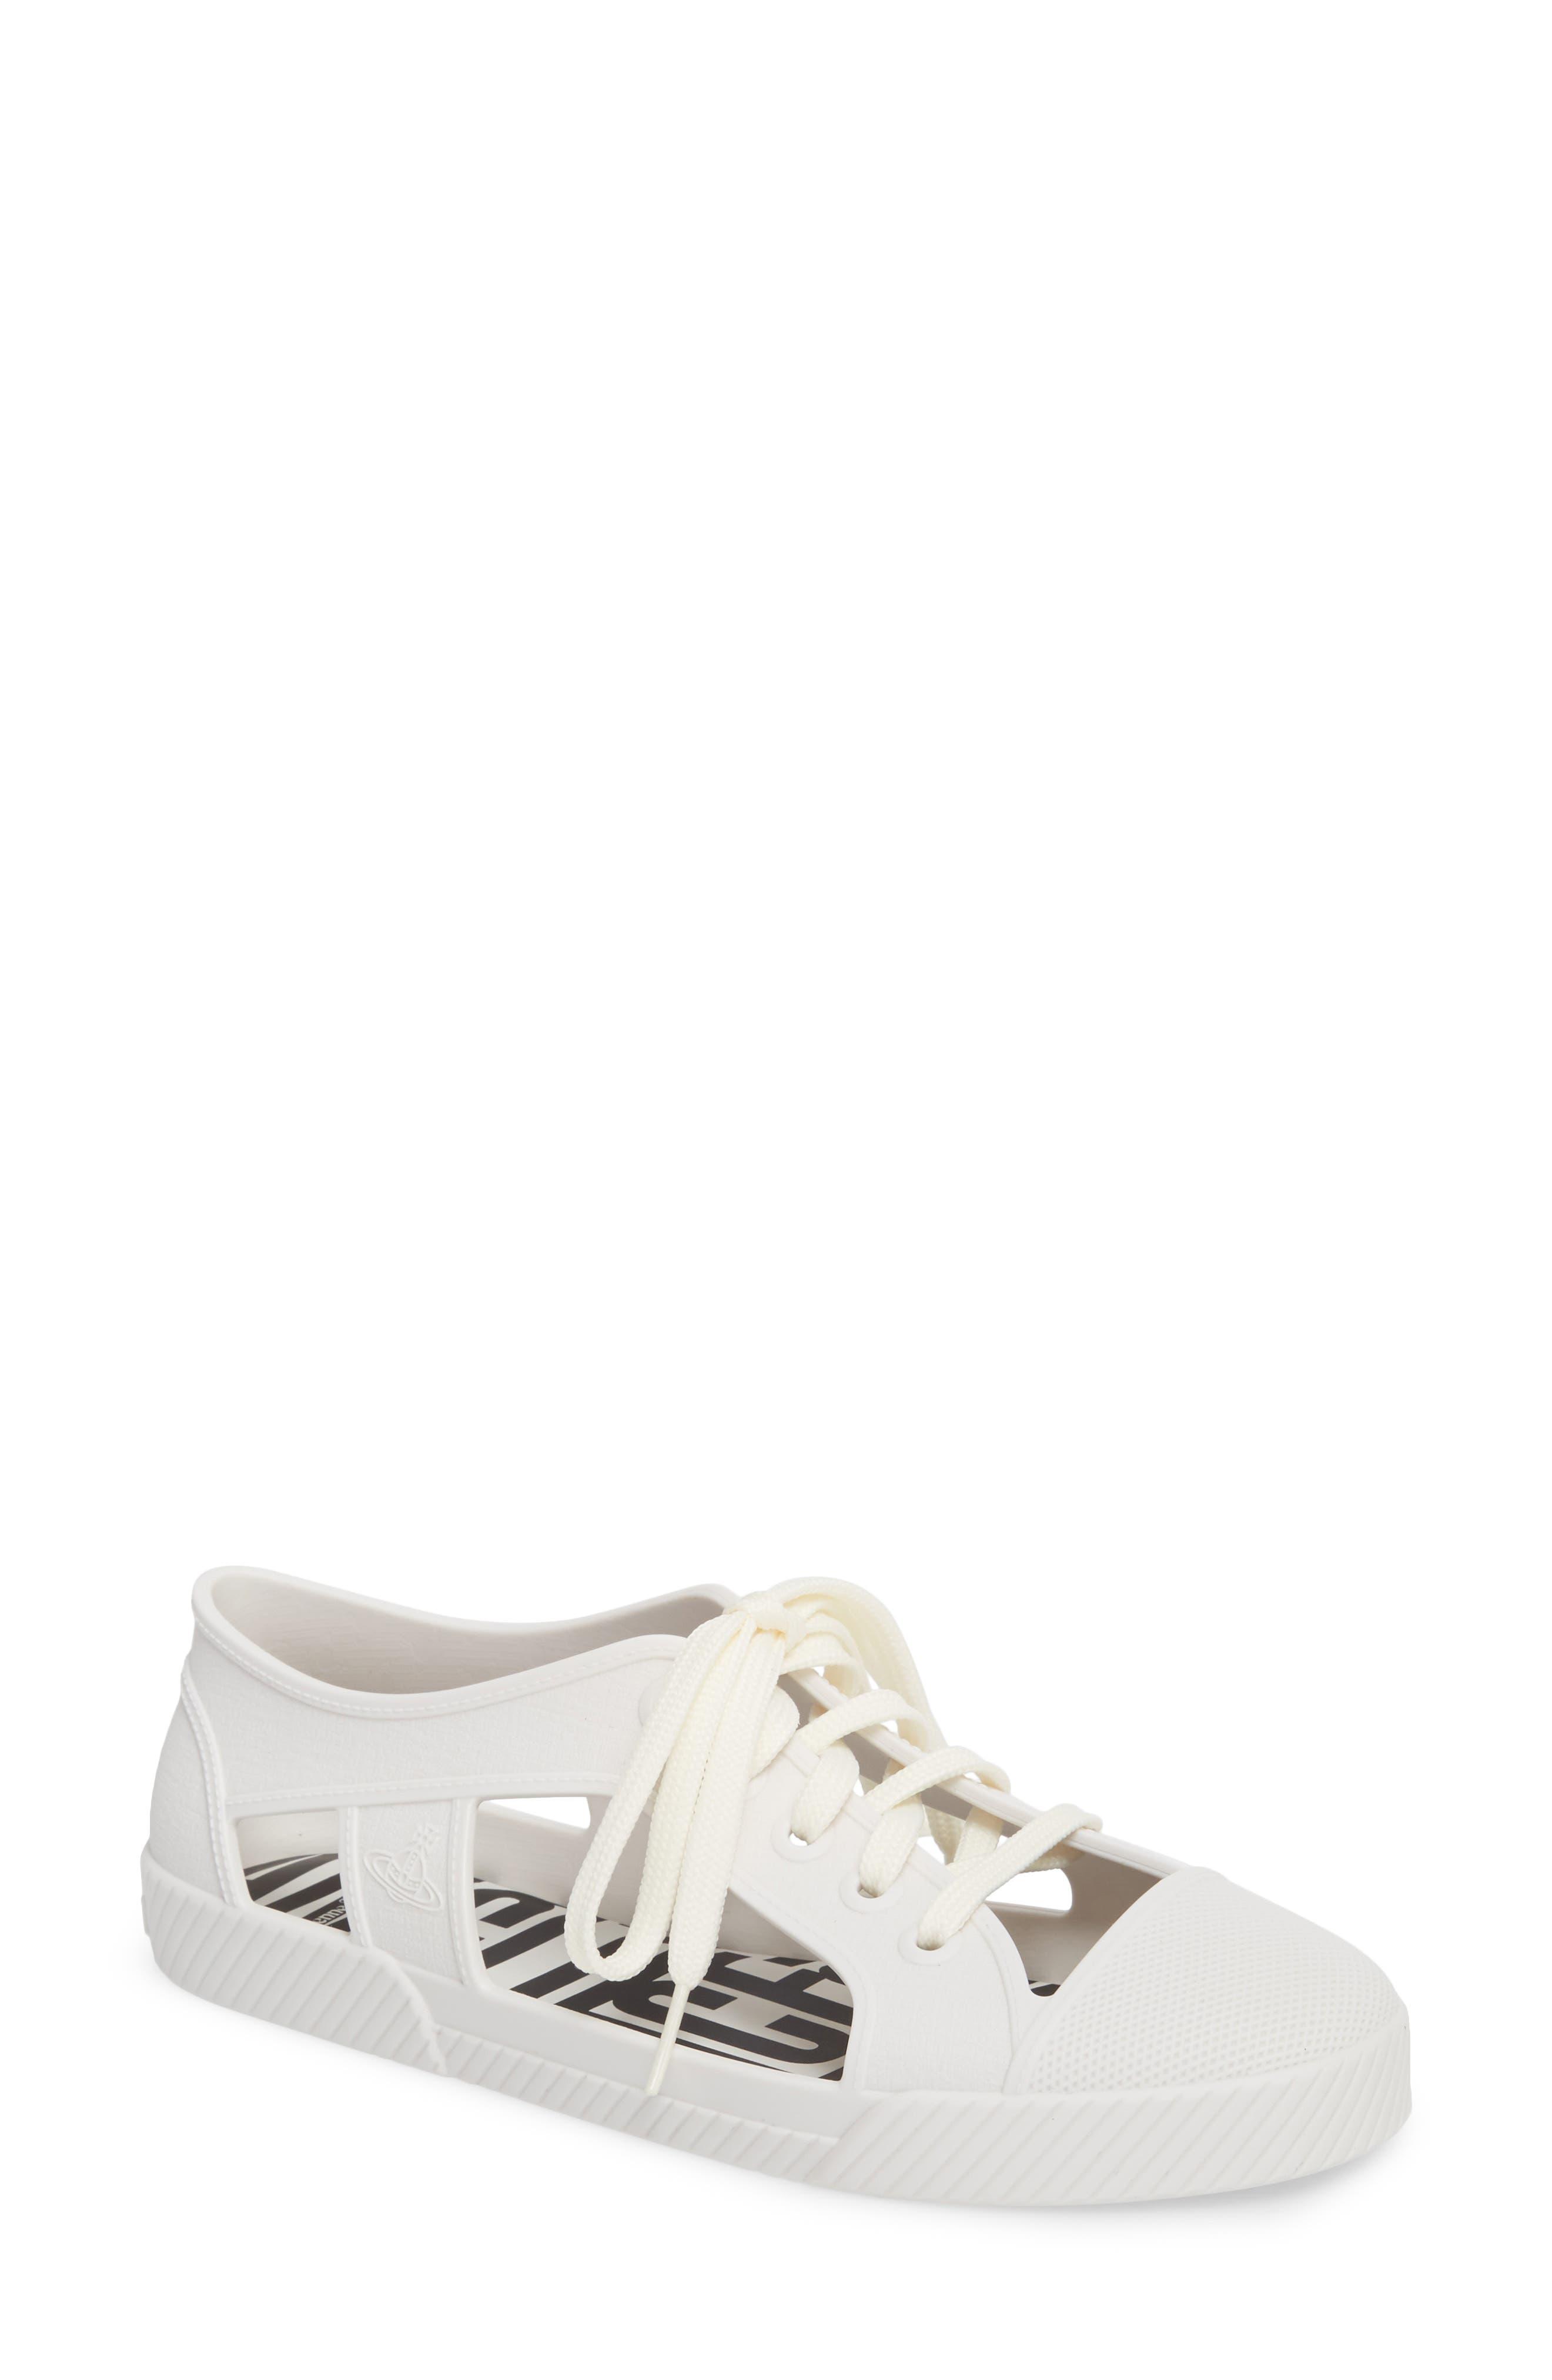 X Vivienne Westwood Brighton Sneaker in White